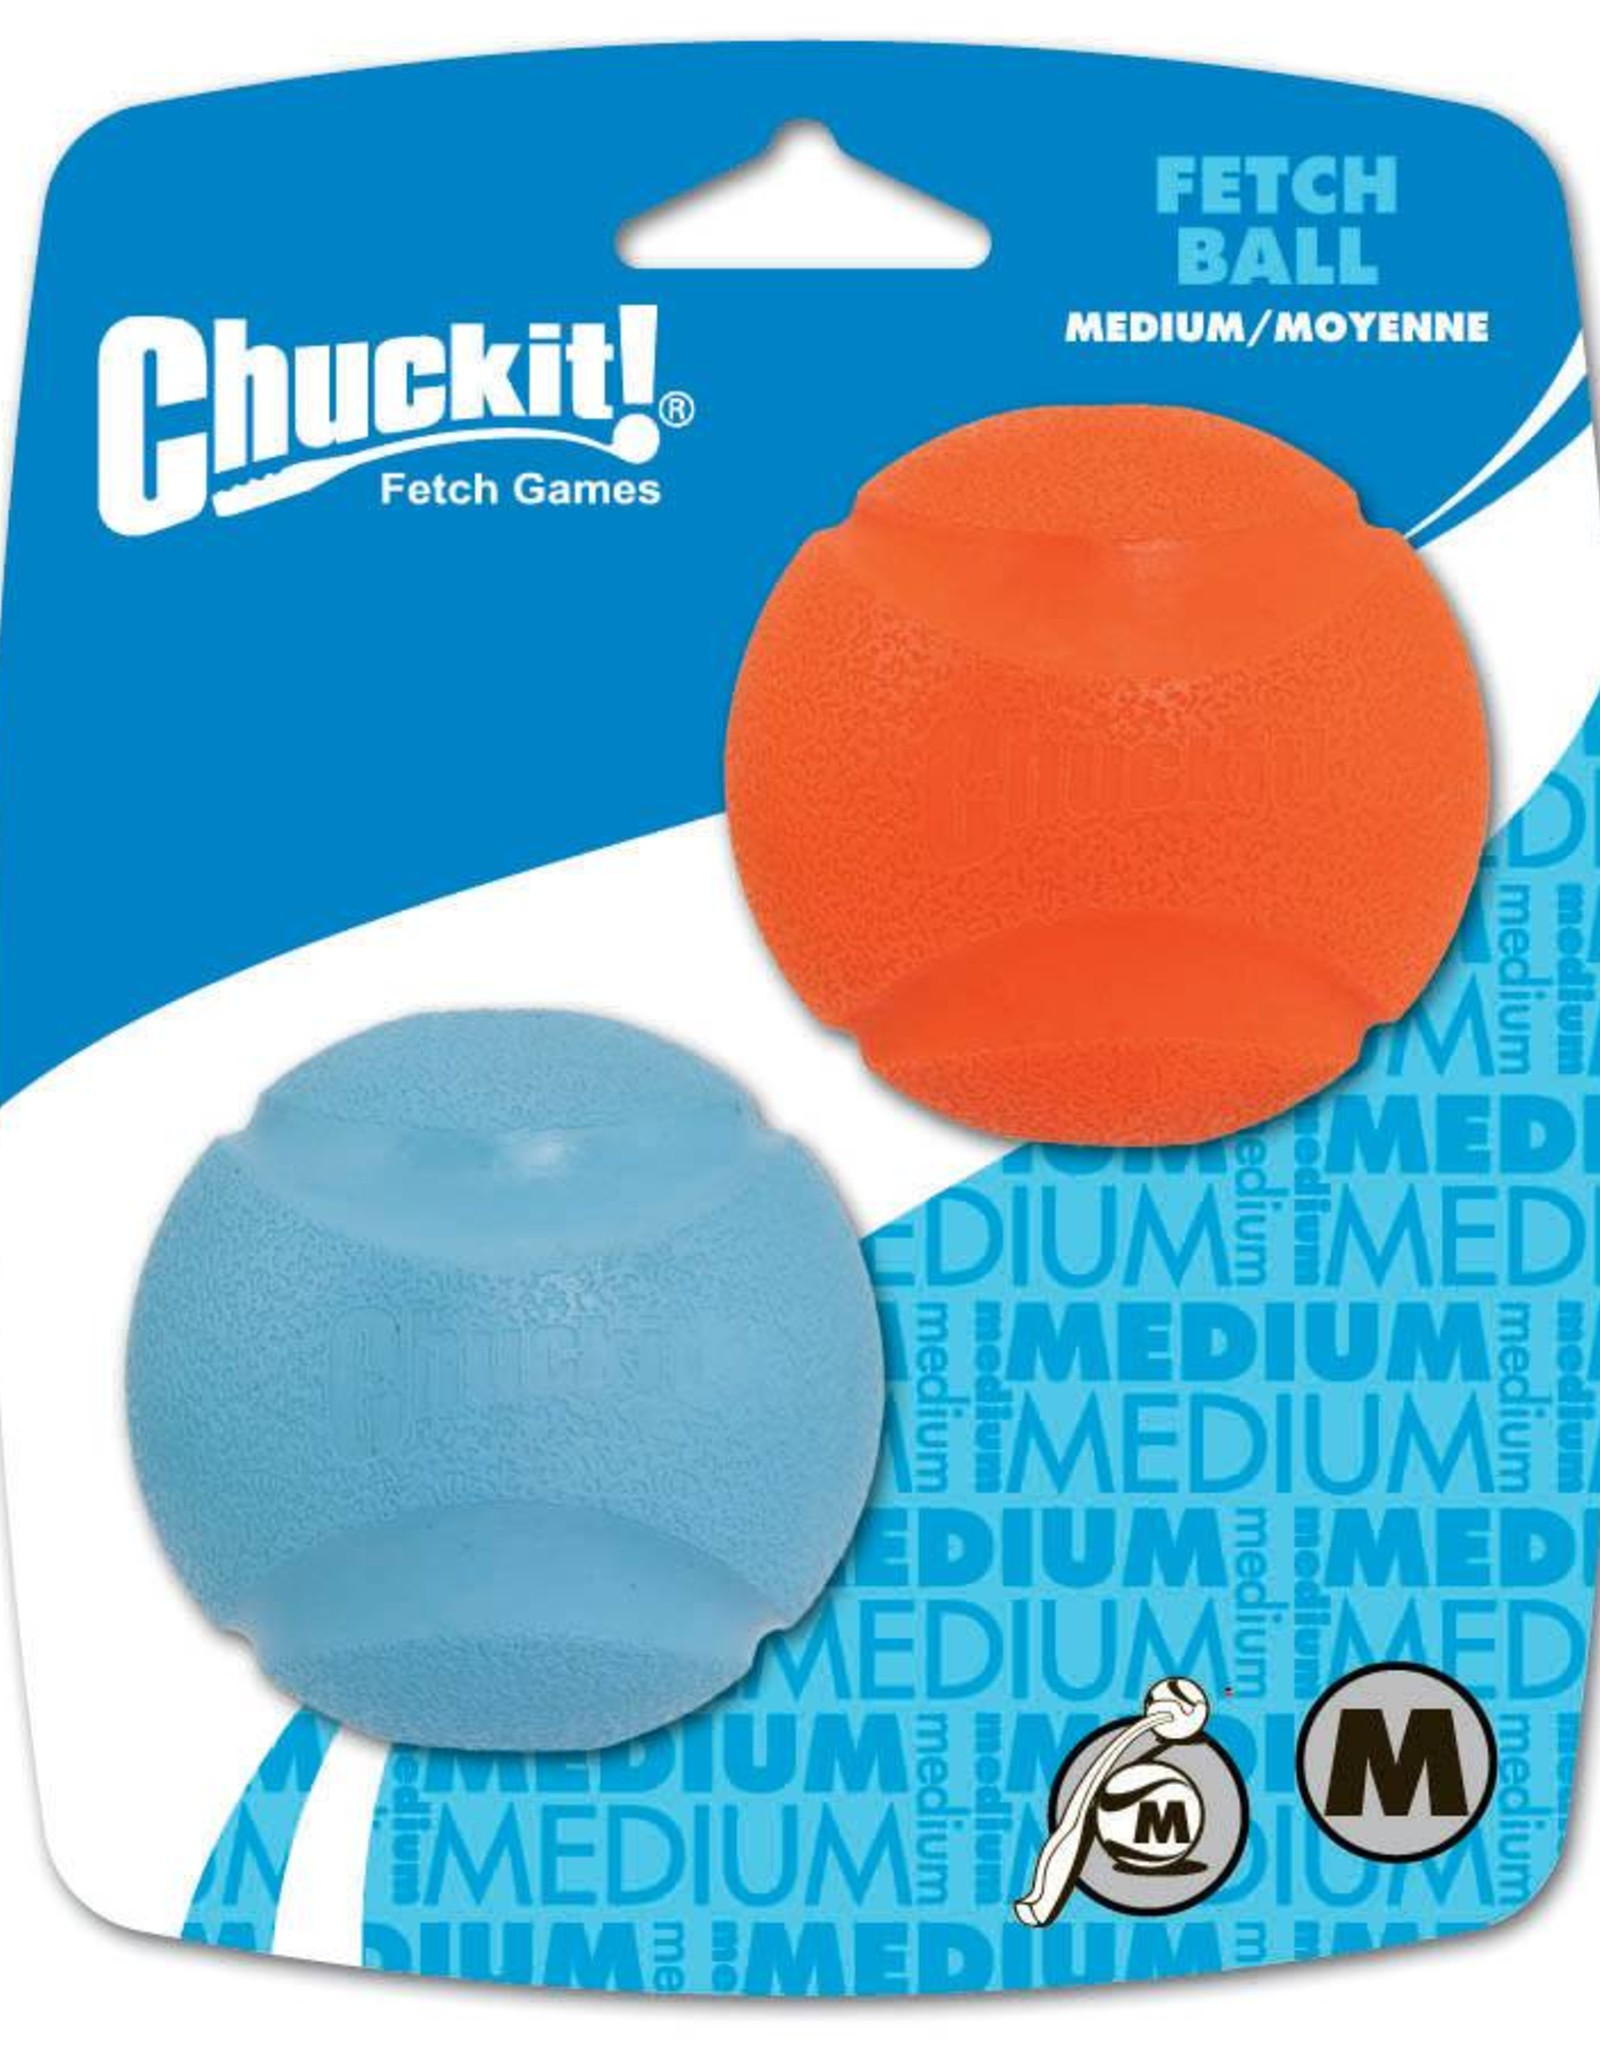 Chuckit Fetch Ball Dog Toy, Medium 6.5cm, 2 pack